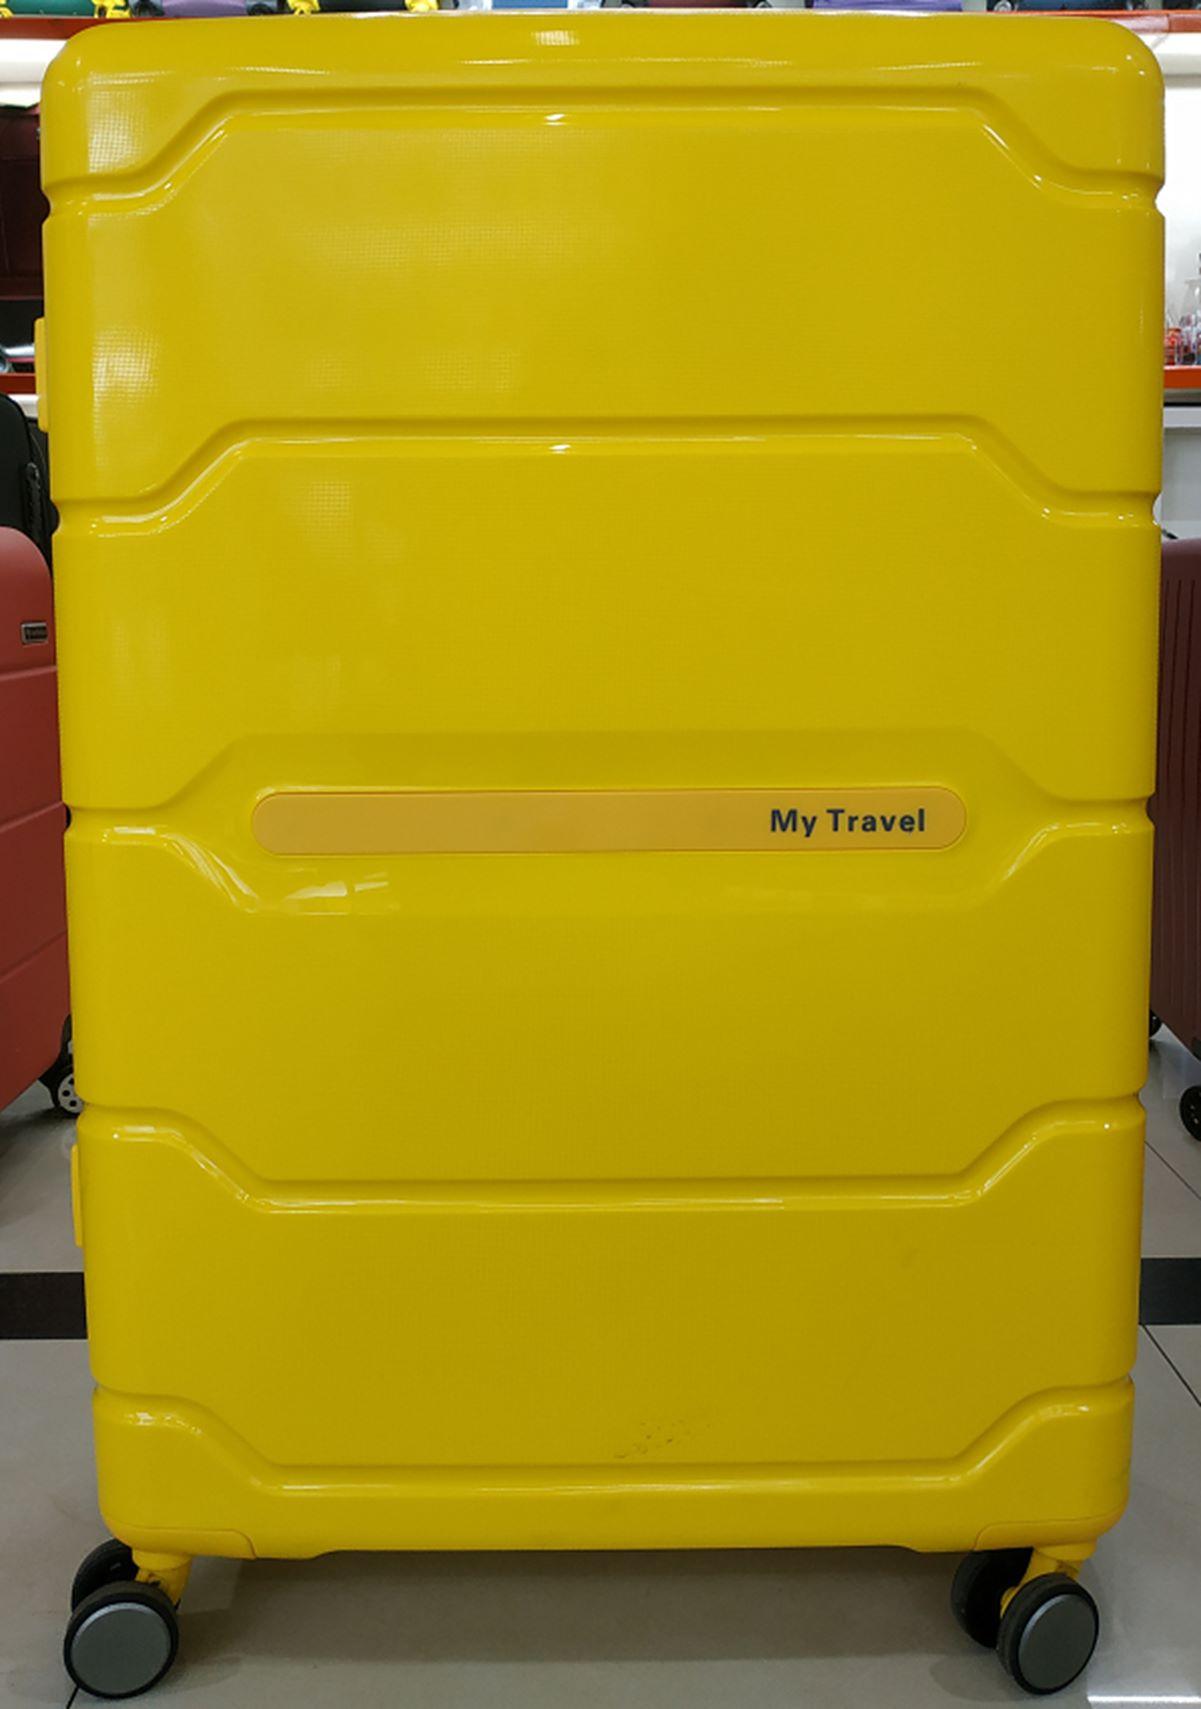 PP058三件套拉杆箱 20-24-28寸 义乌好货 旅行箱行李箱男女万向轮拉杆箱